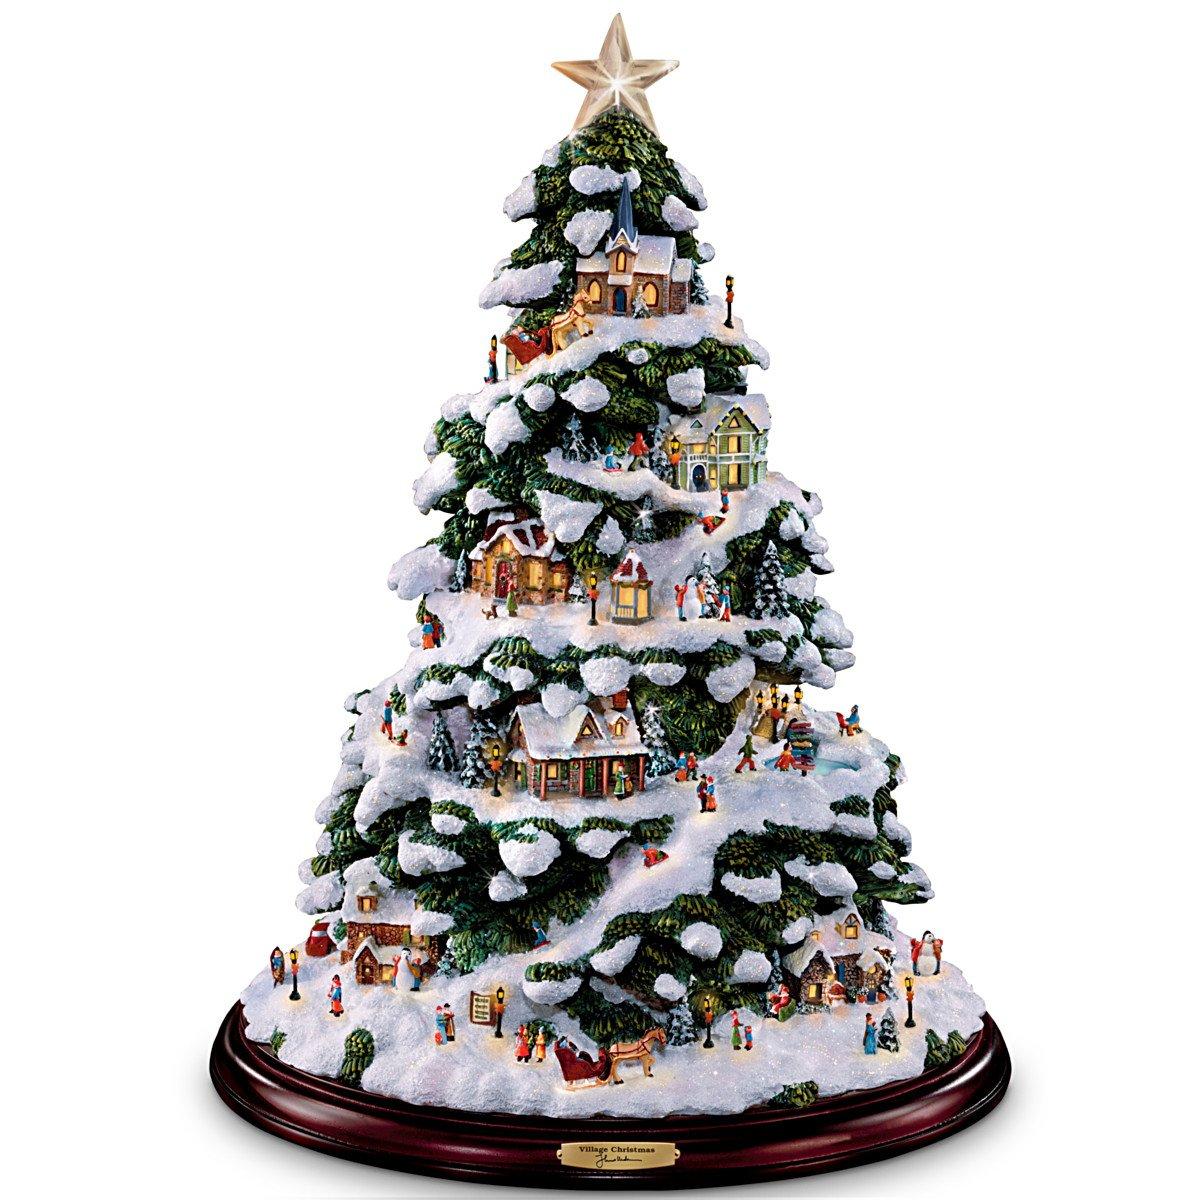 Thomas Kinkade Village Christmas Artificial Tabletop Christmas Tree by The Bradford Exchange